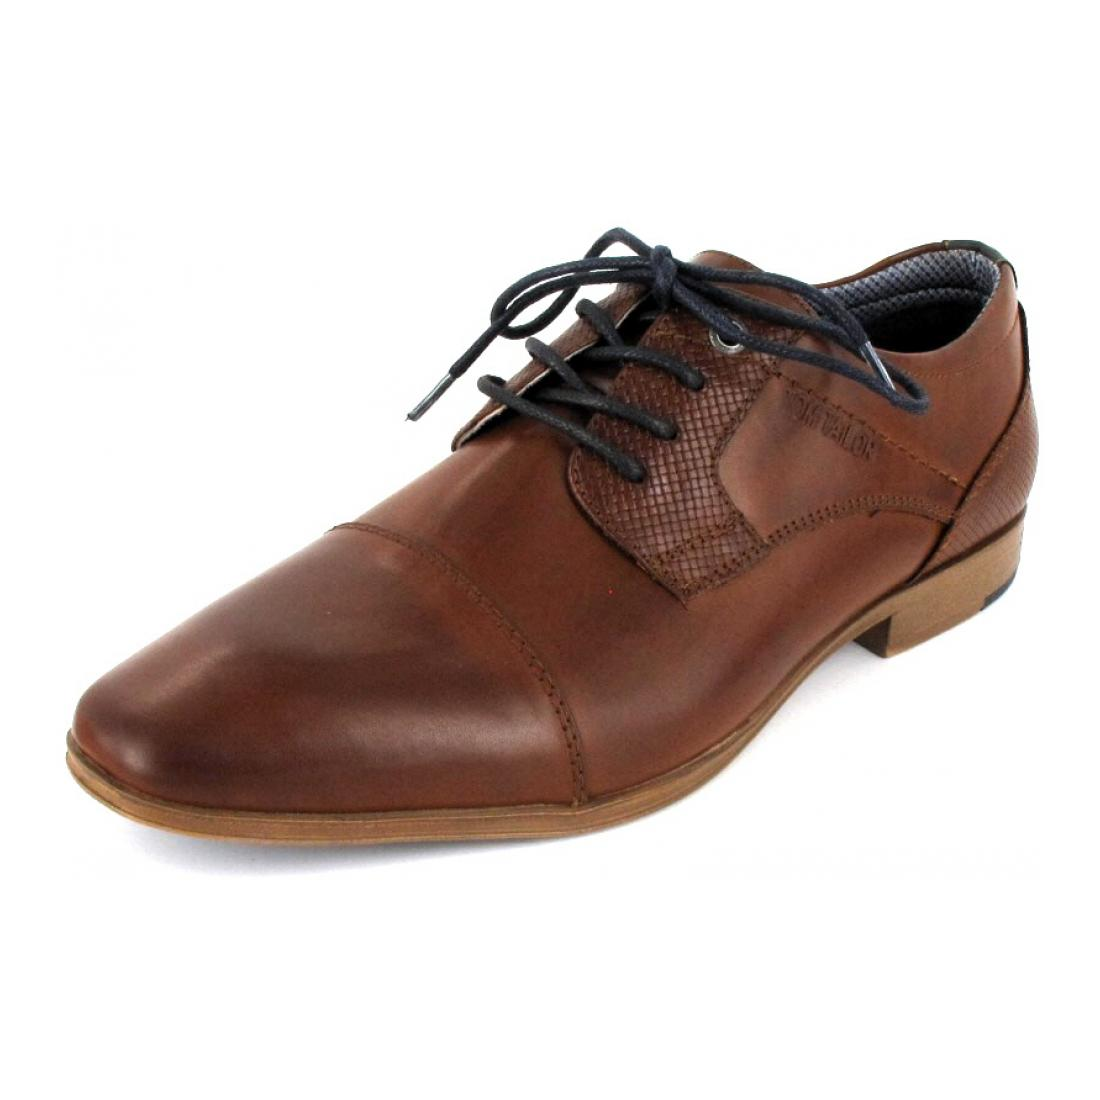 Tom Tailor Businesss Schuh